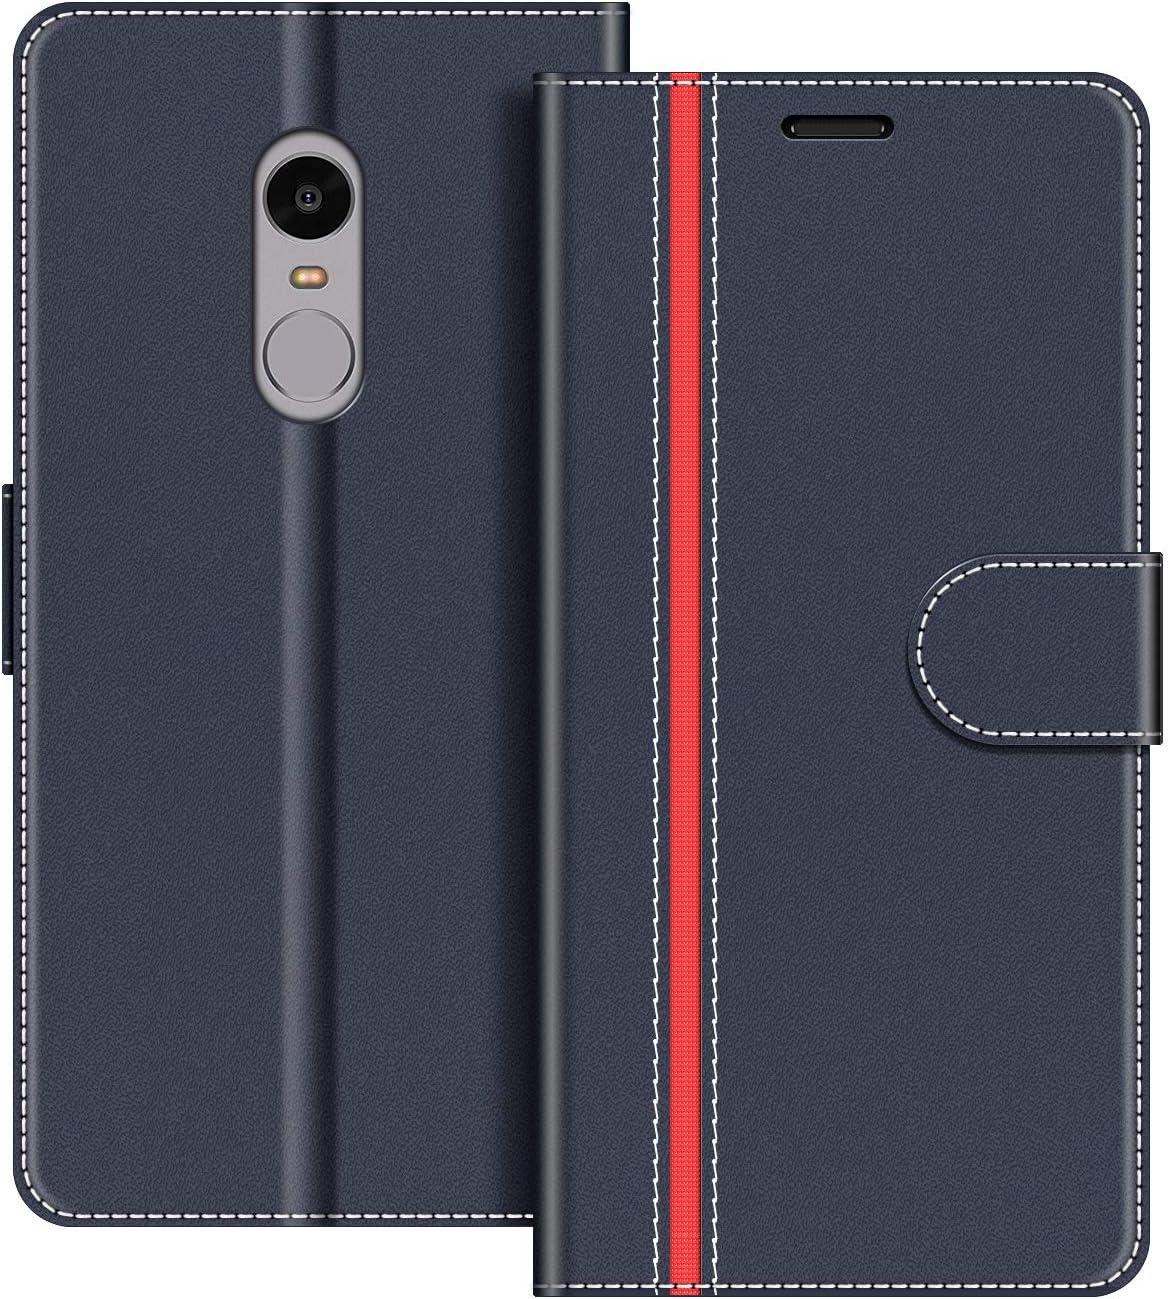 COODIO Funda Xiaomi Redmi Note 4 con Tapa, Funda Movil Xiaomi Redmi Note 4, Funda Libro Xiaomi Redmi Note 4 Carcasa Magnético Funda para Xiaomi Redmi Note 4, Azul Oscuro/Rojo: Amazon.es: Electrónica